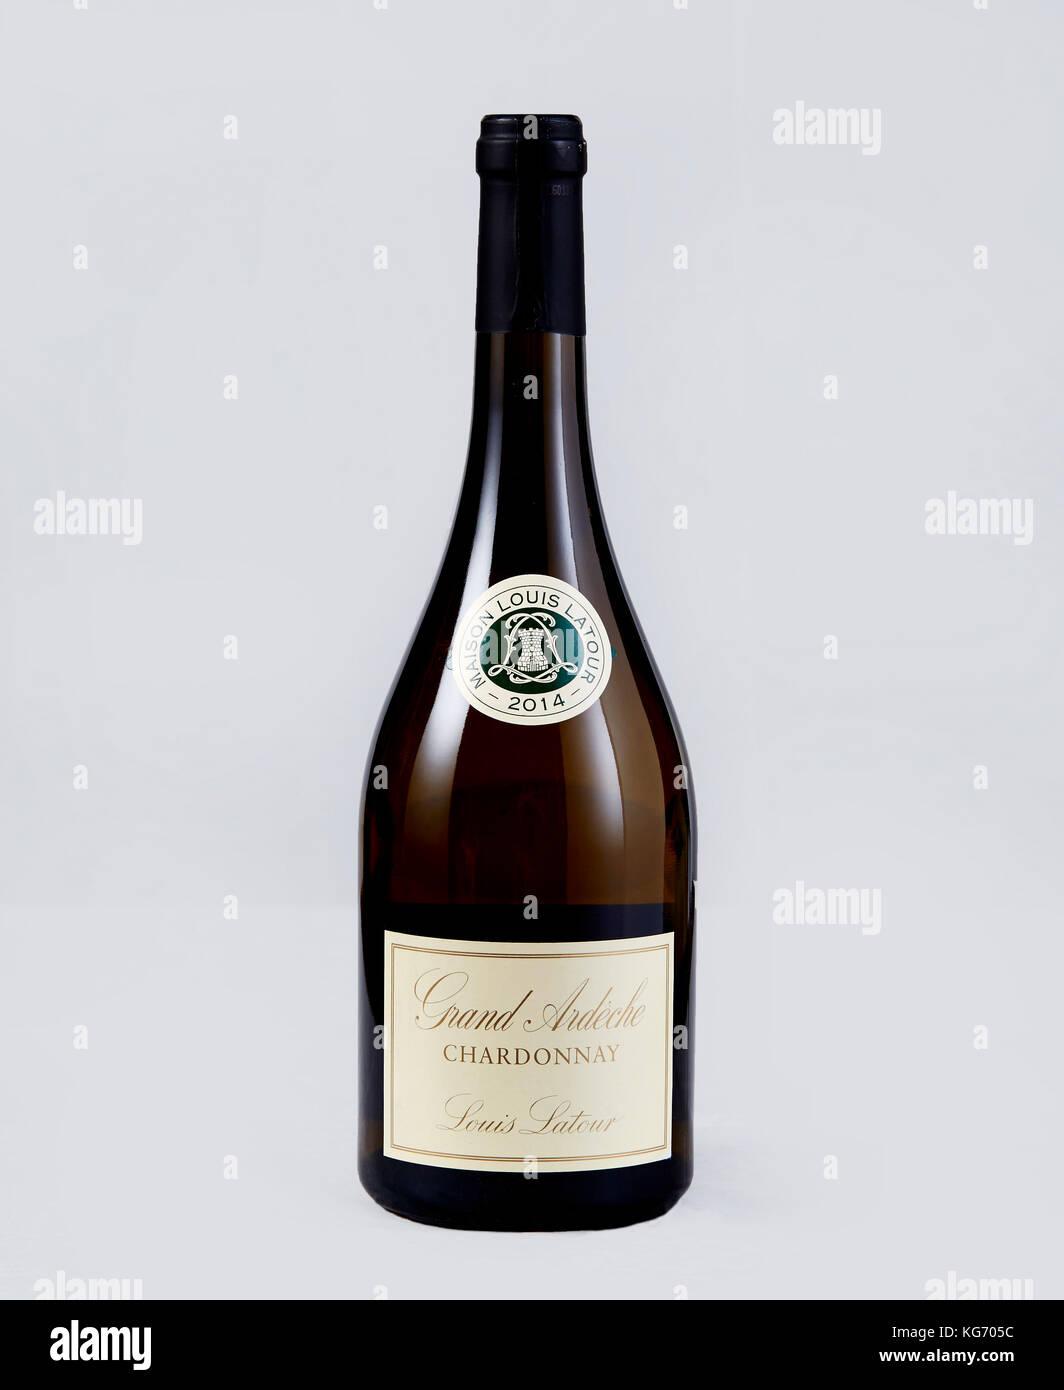 Bottle of Grande Ardeche Chardonnay - Stock Image